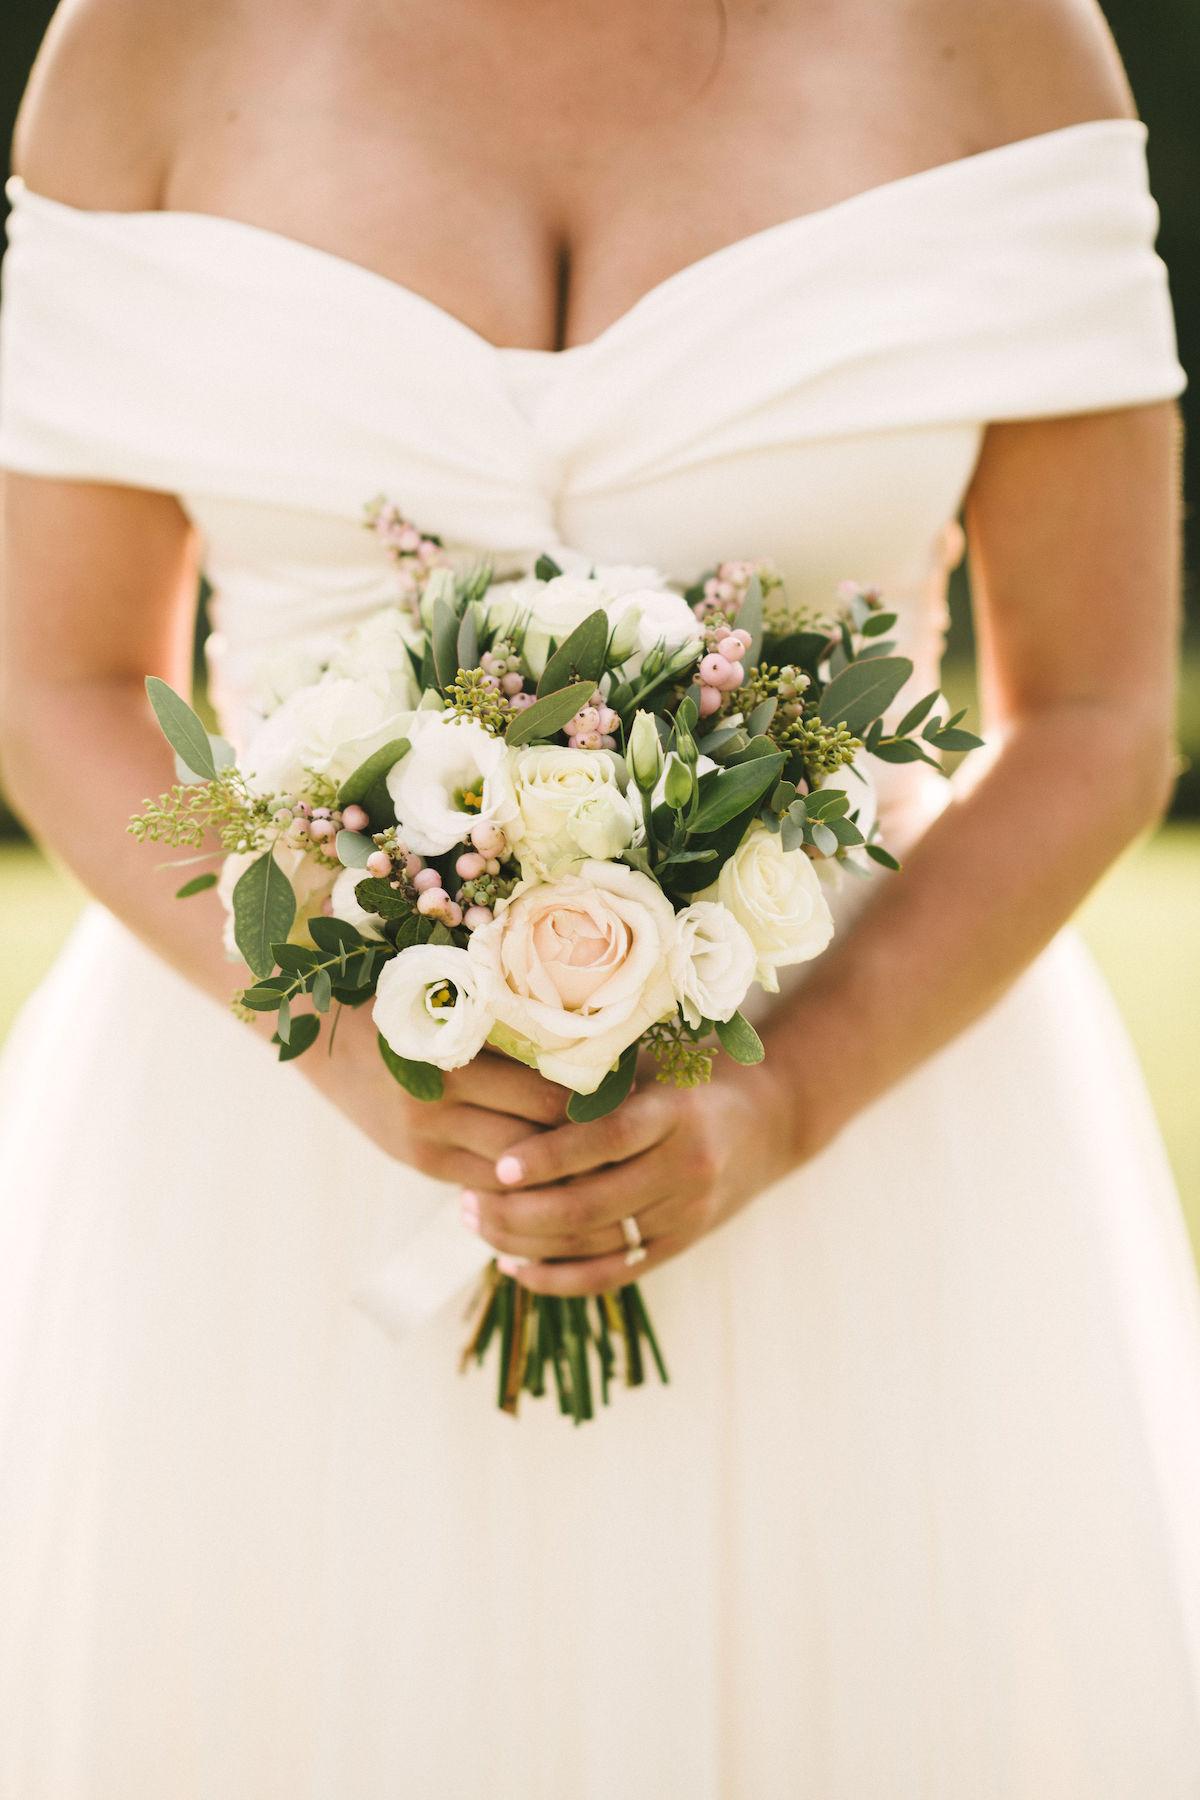 Beautiful bride Lilli wore a wedding dress by Halfpenny London